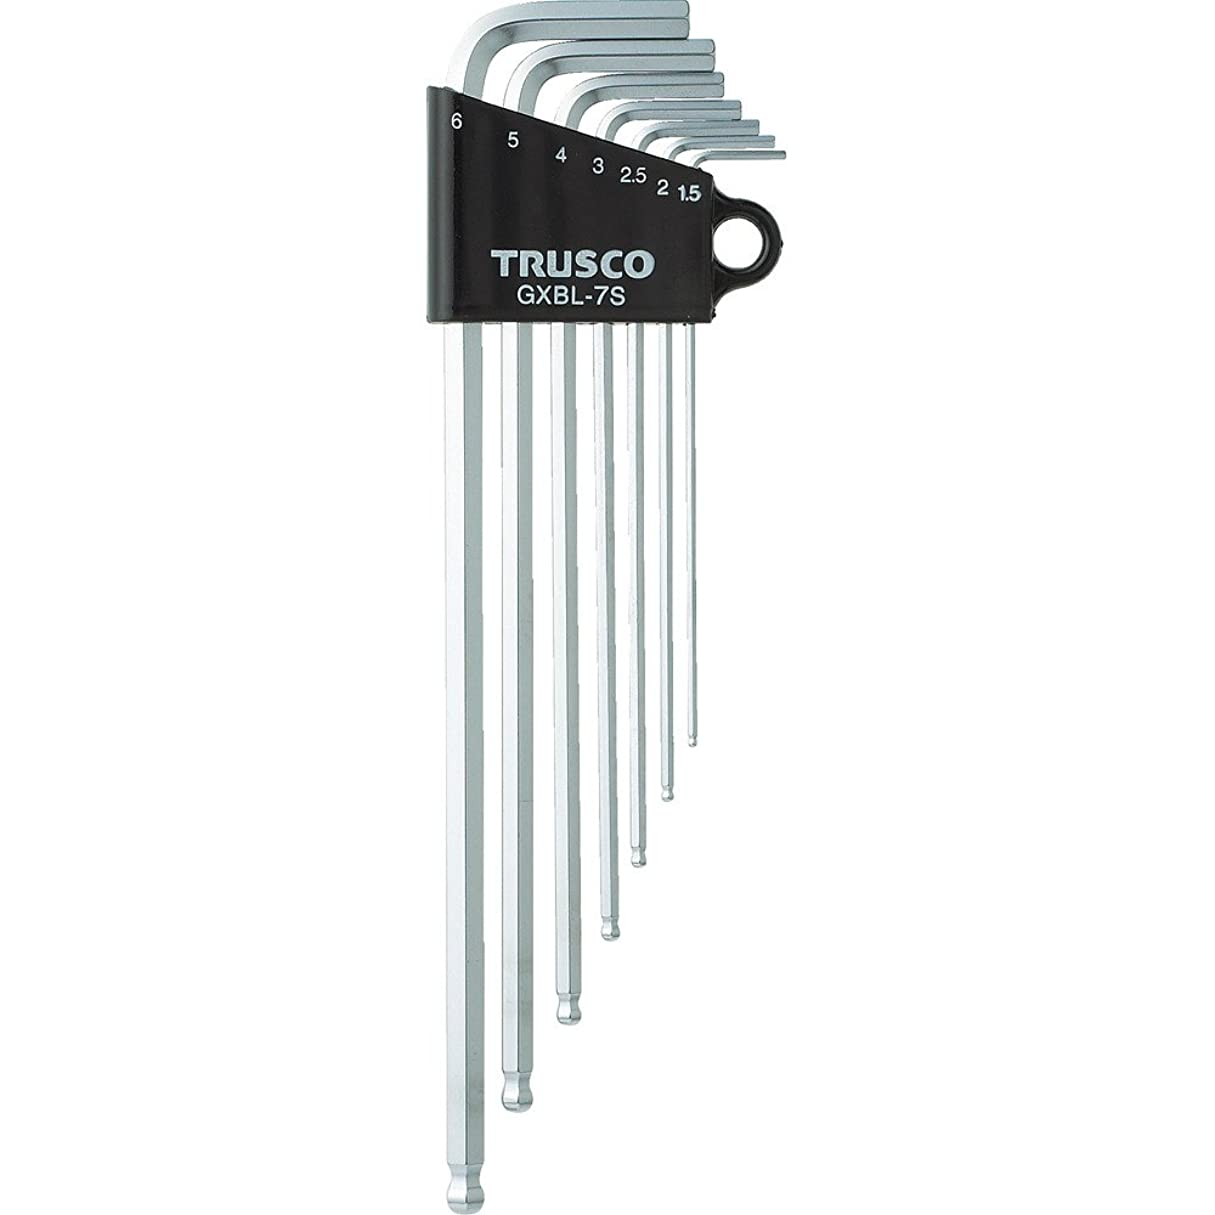 TRUSCO(トラスコ) ロングボールポイント六角棒セット 7本組 GXBL-7S